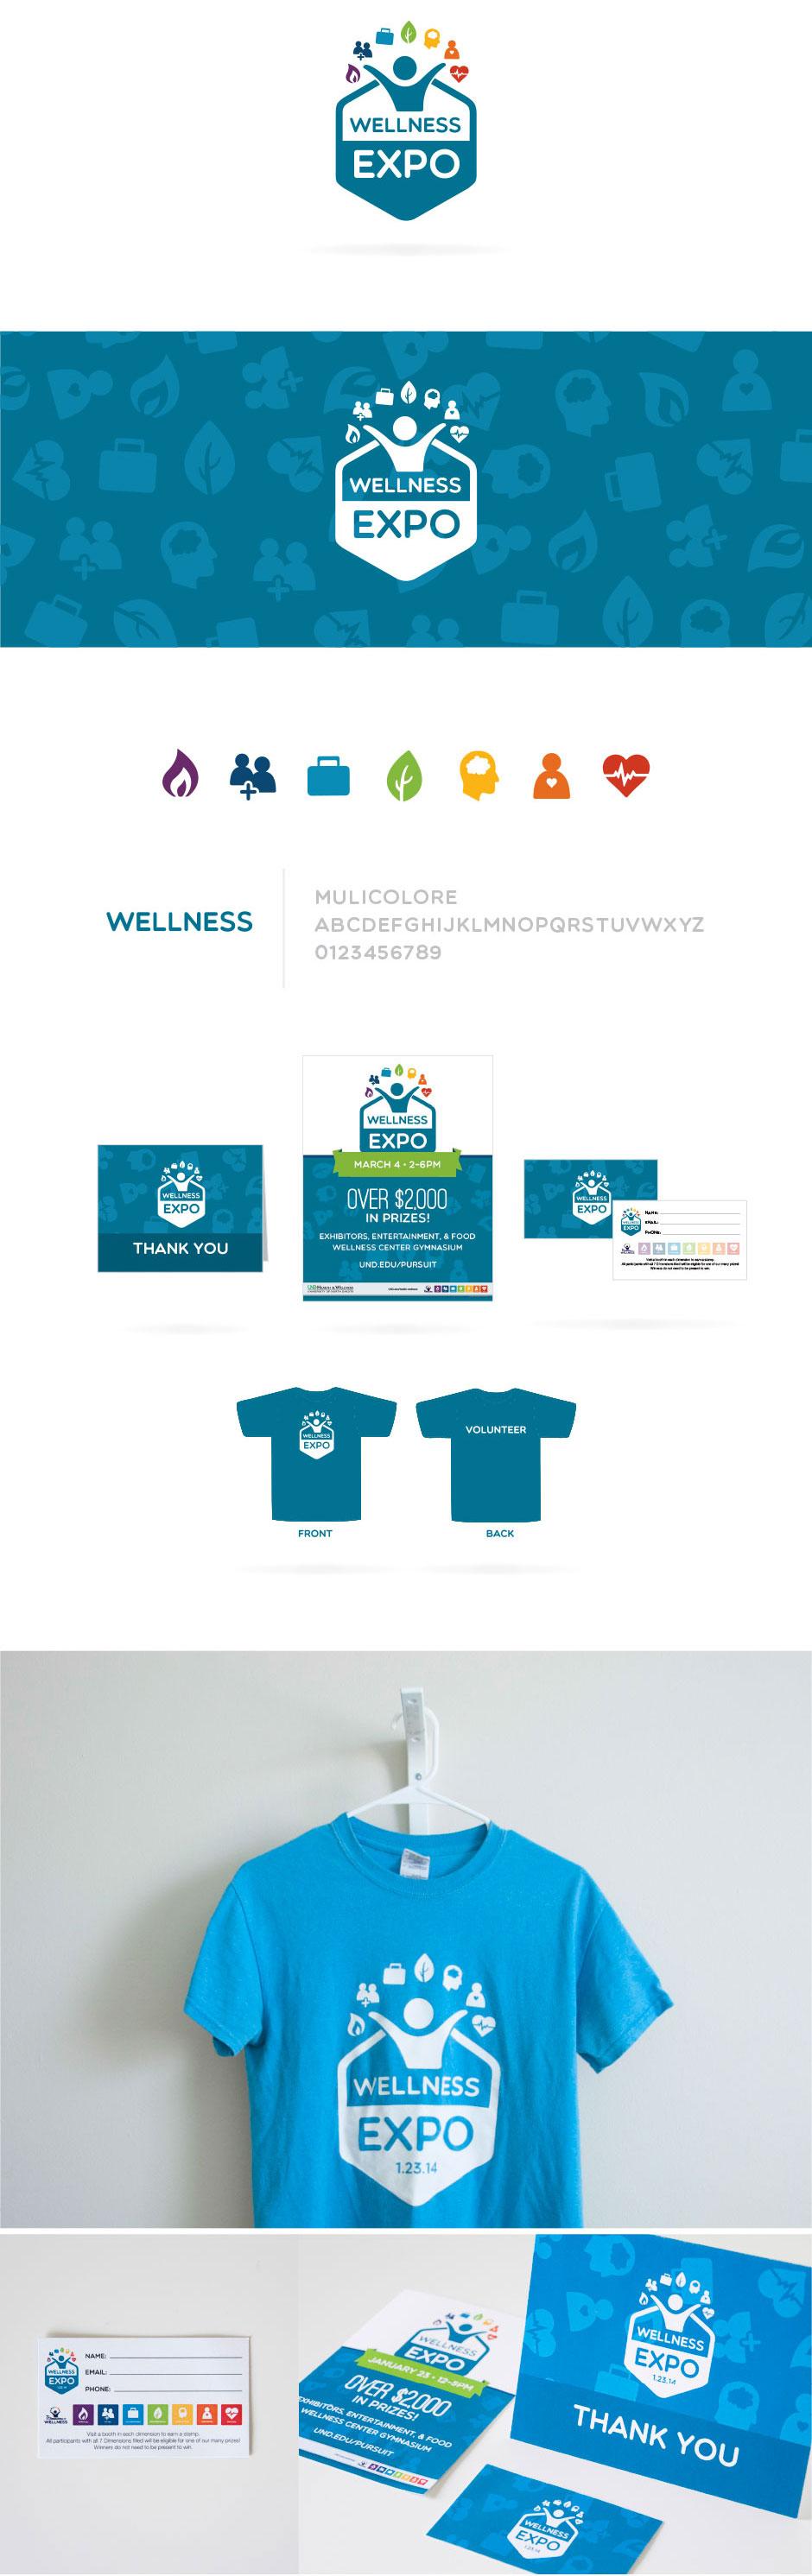 und-wellnessexpo.jpg